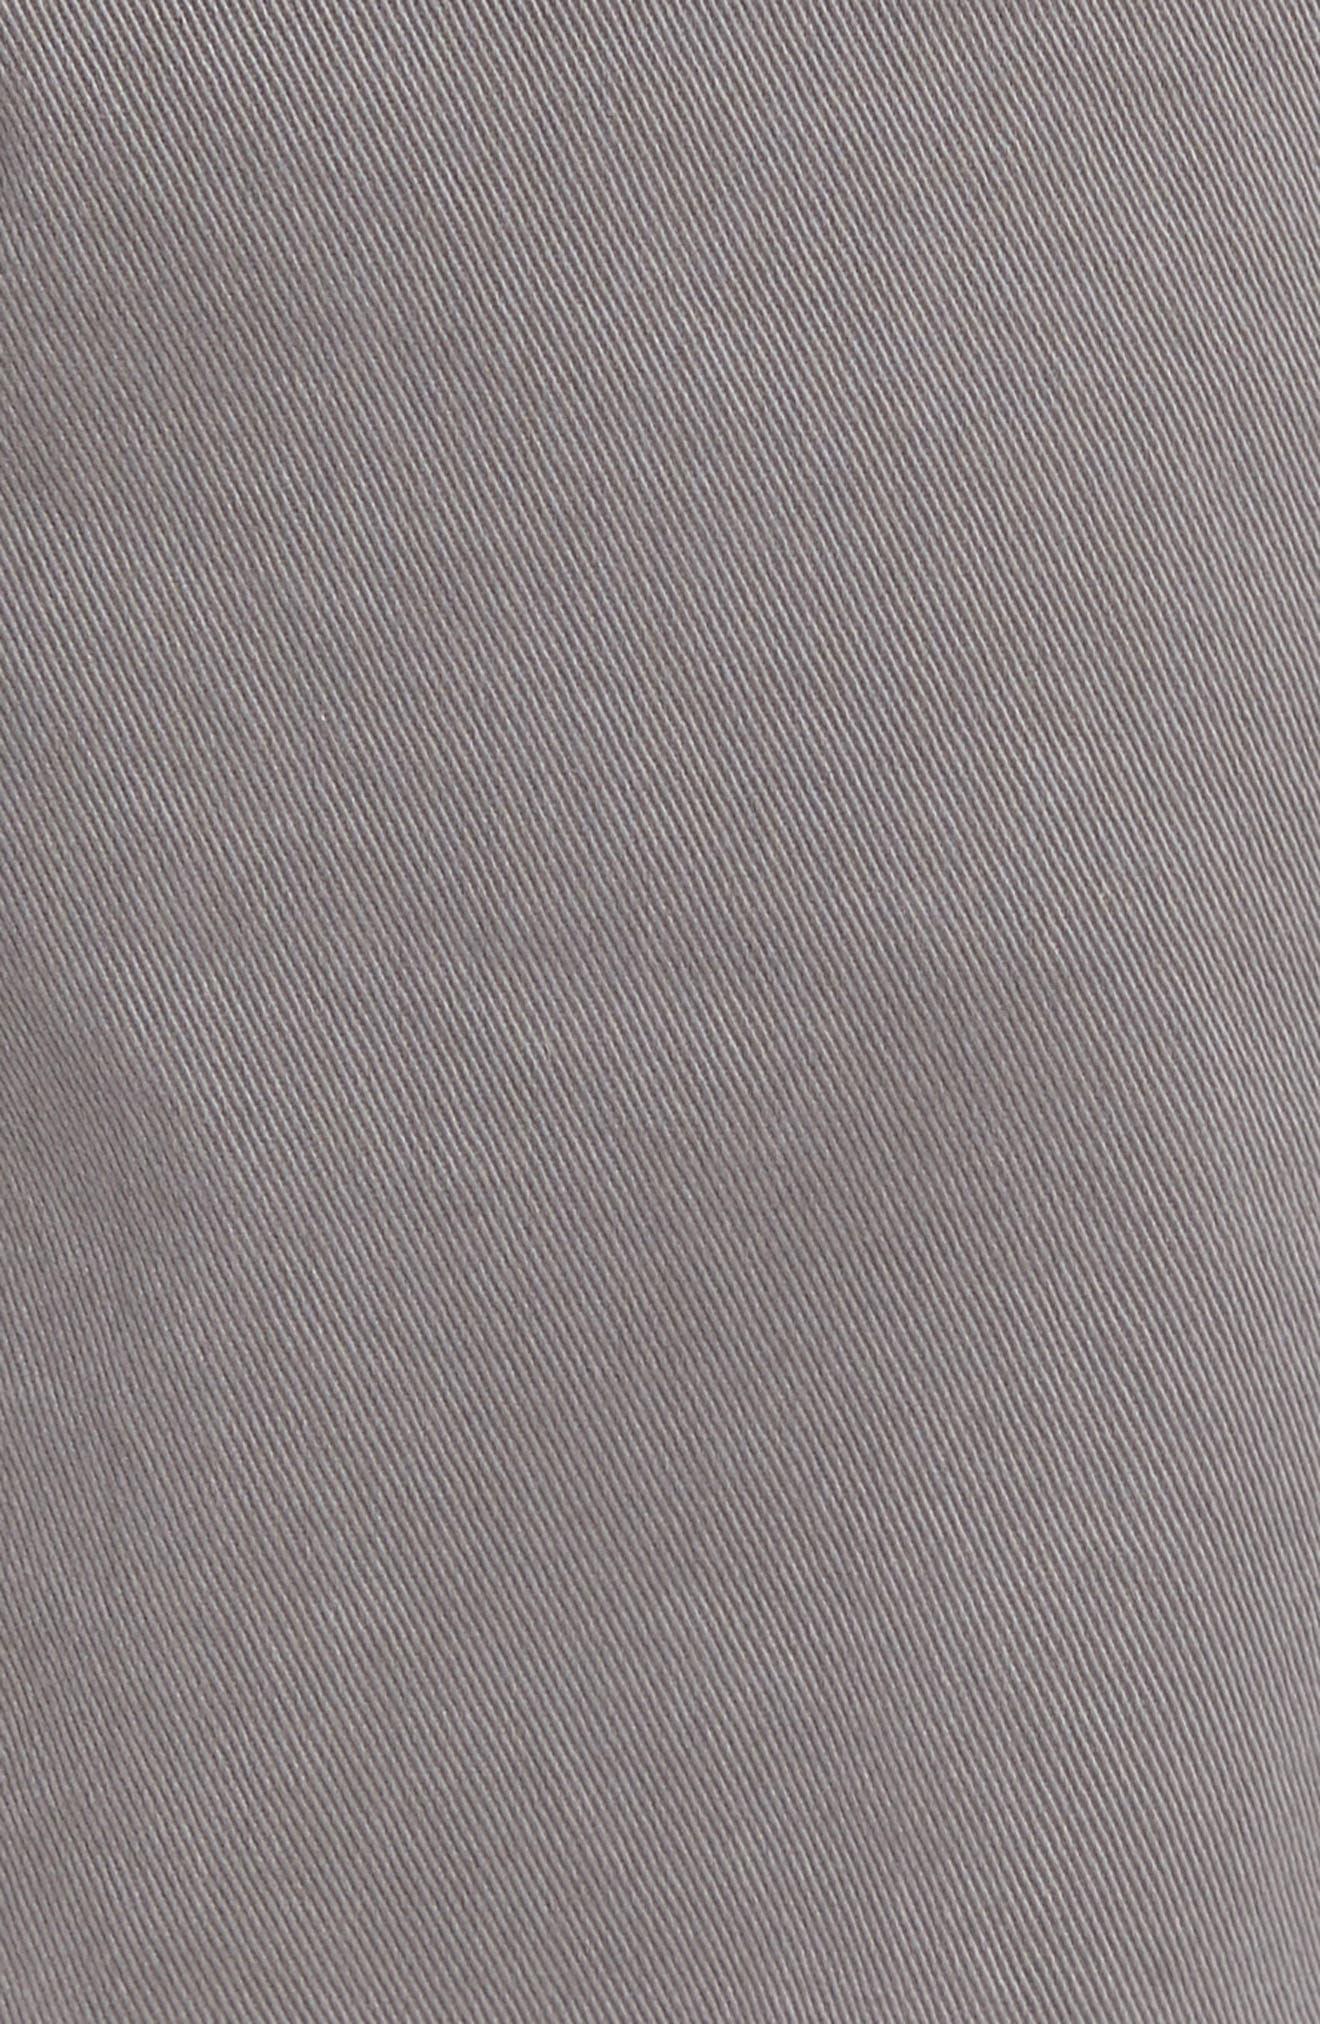 'Federal' Slim Straight Leg Twill Pants,                             Alternate thumbnail 4, color,                             Granite Stone